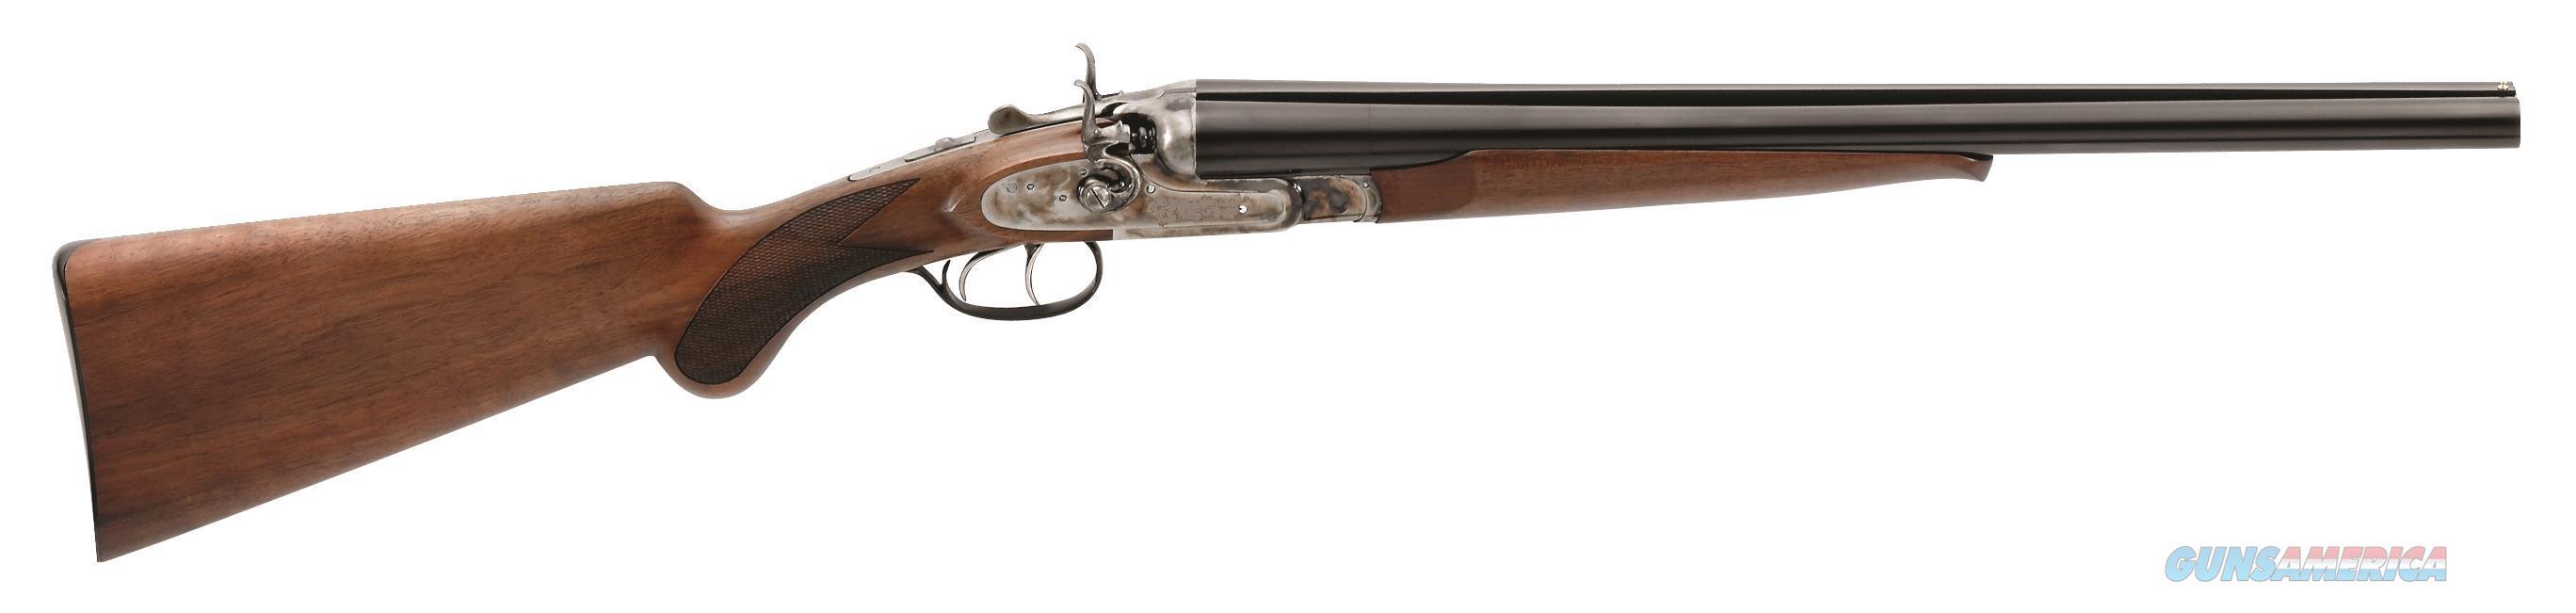 "Taylors And Company S70712ns Wyatt Earp No Stamp Side By Side 12 Gauge 20"" 2.75"" Walnut Stk Case Hardened Rcvr Blued Barrel S70712NS  Guns > Rifles > TU Misc Rifles"